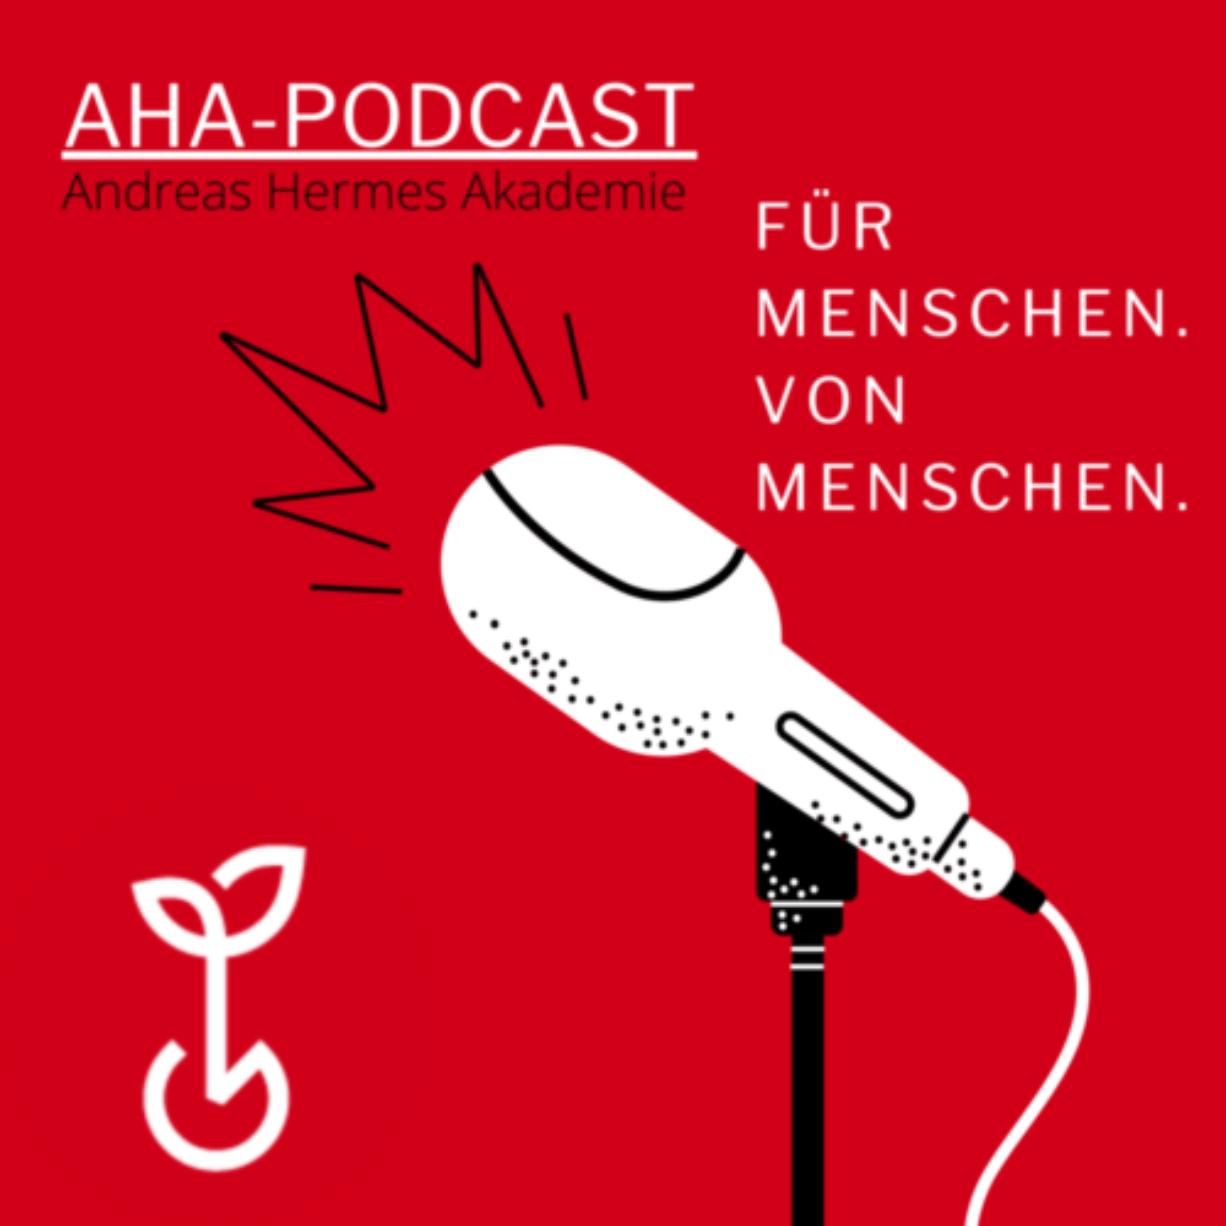 AHA Podcast Cover